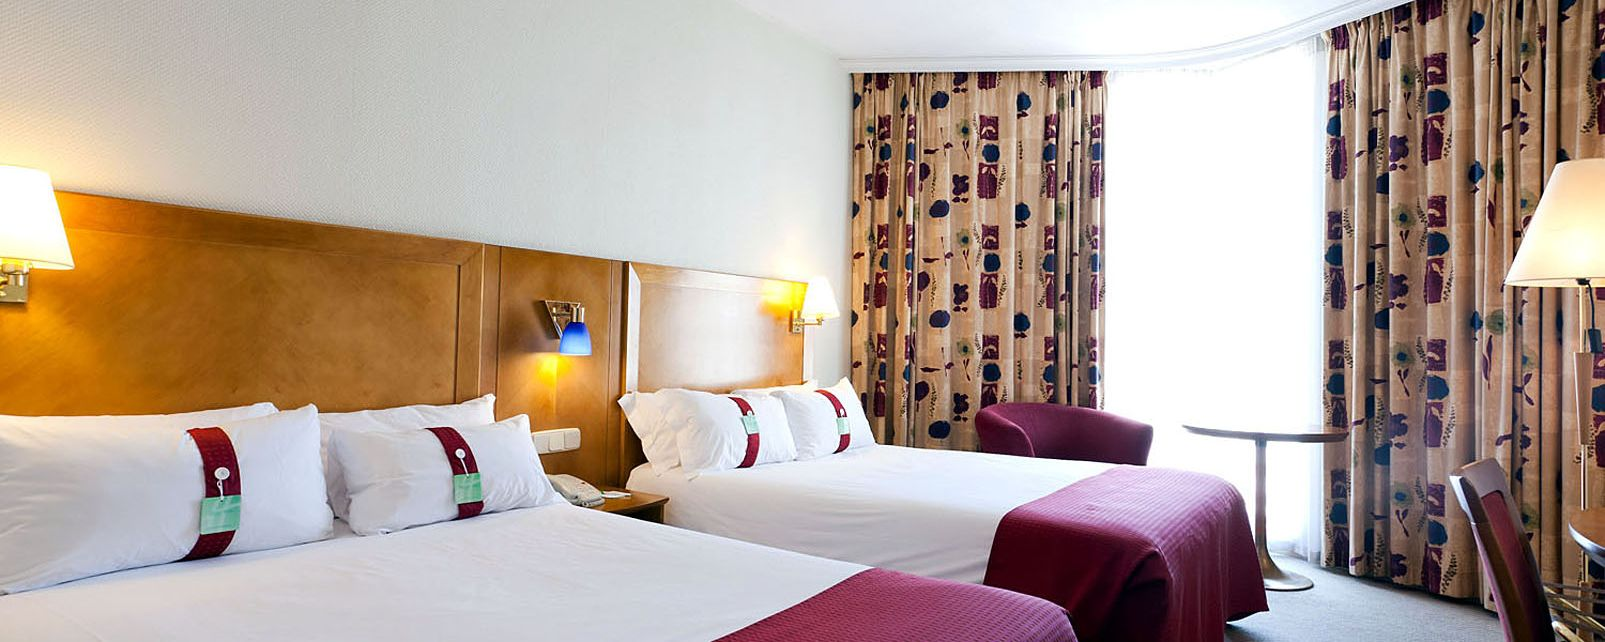 Hotel Holiday Inn Madrid